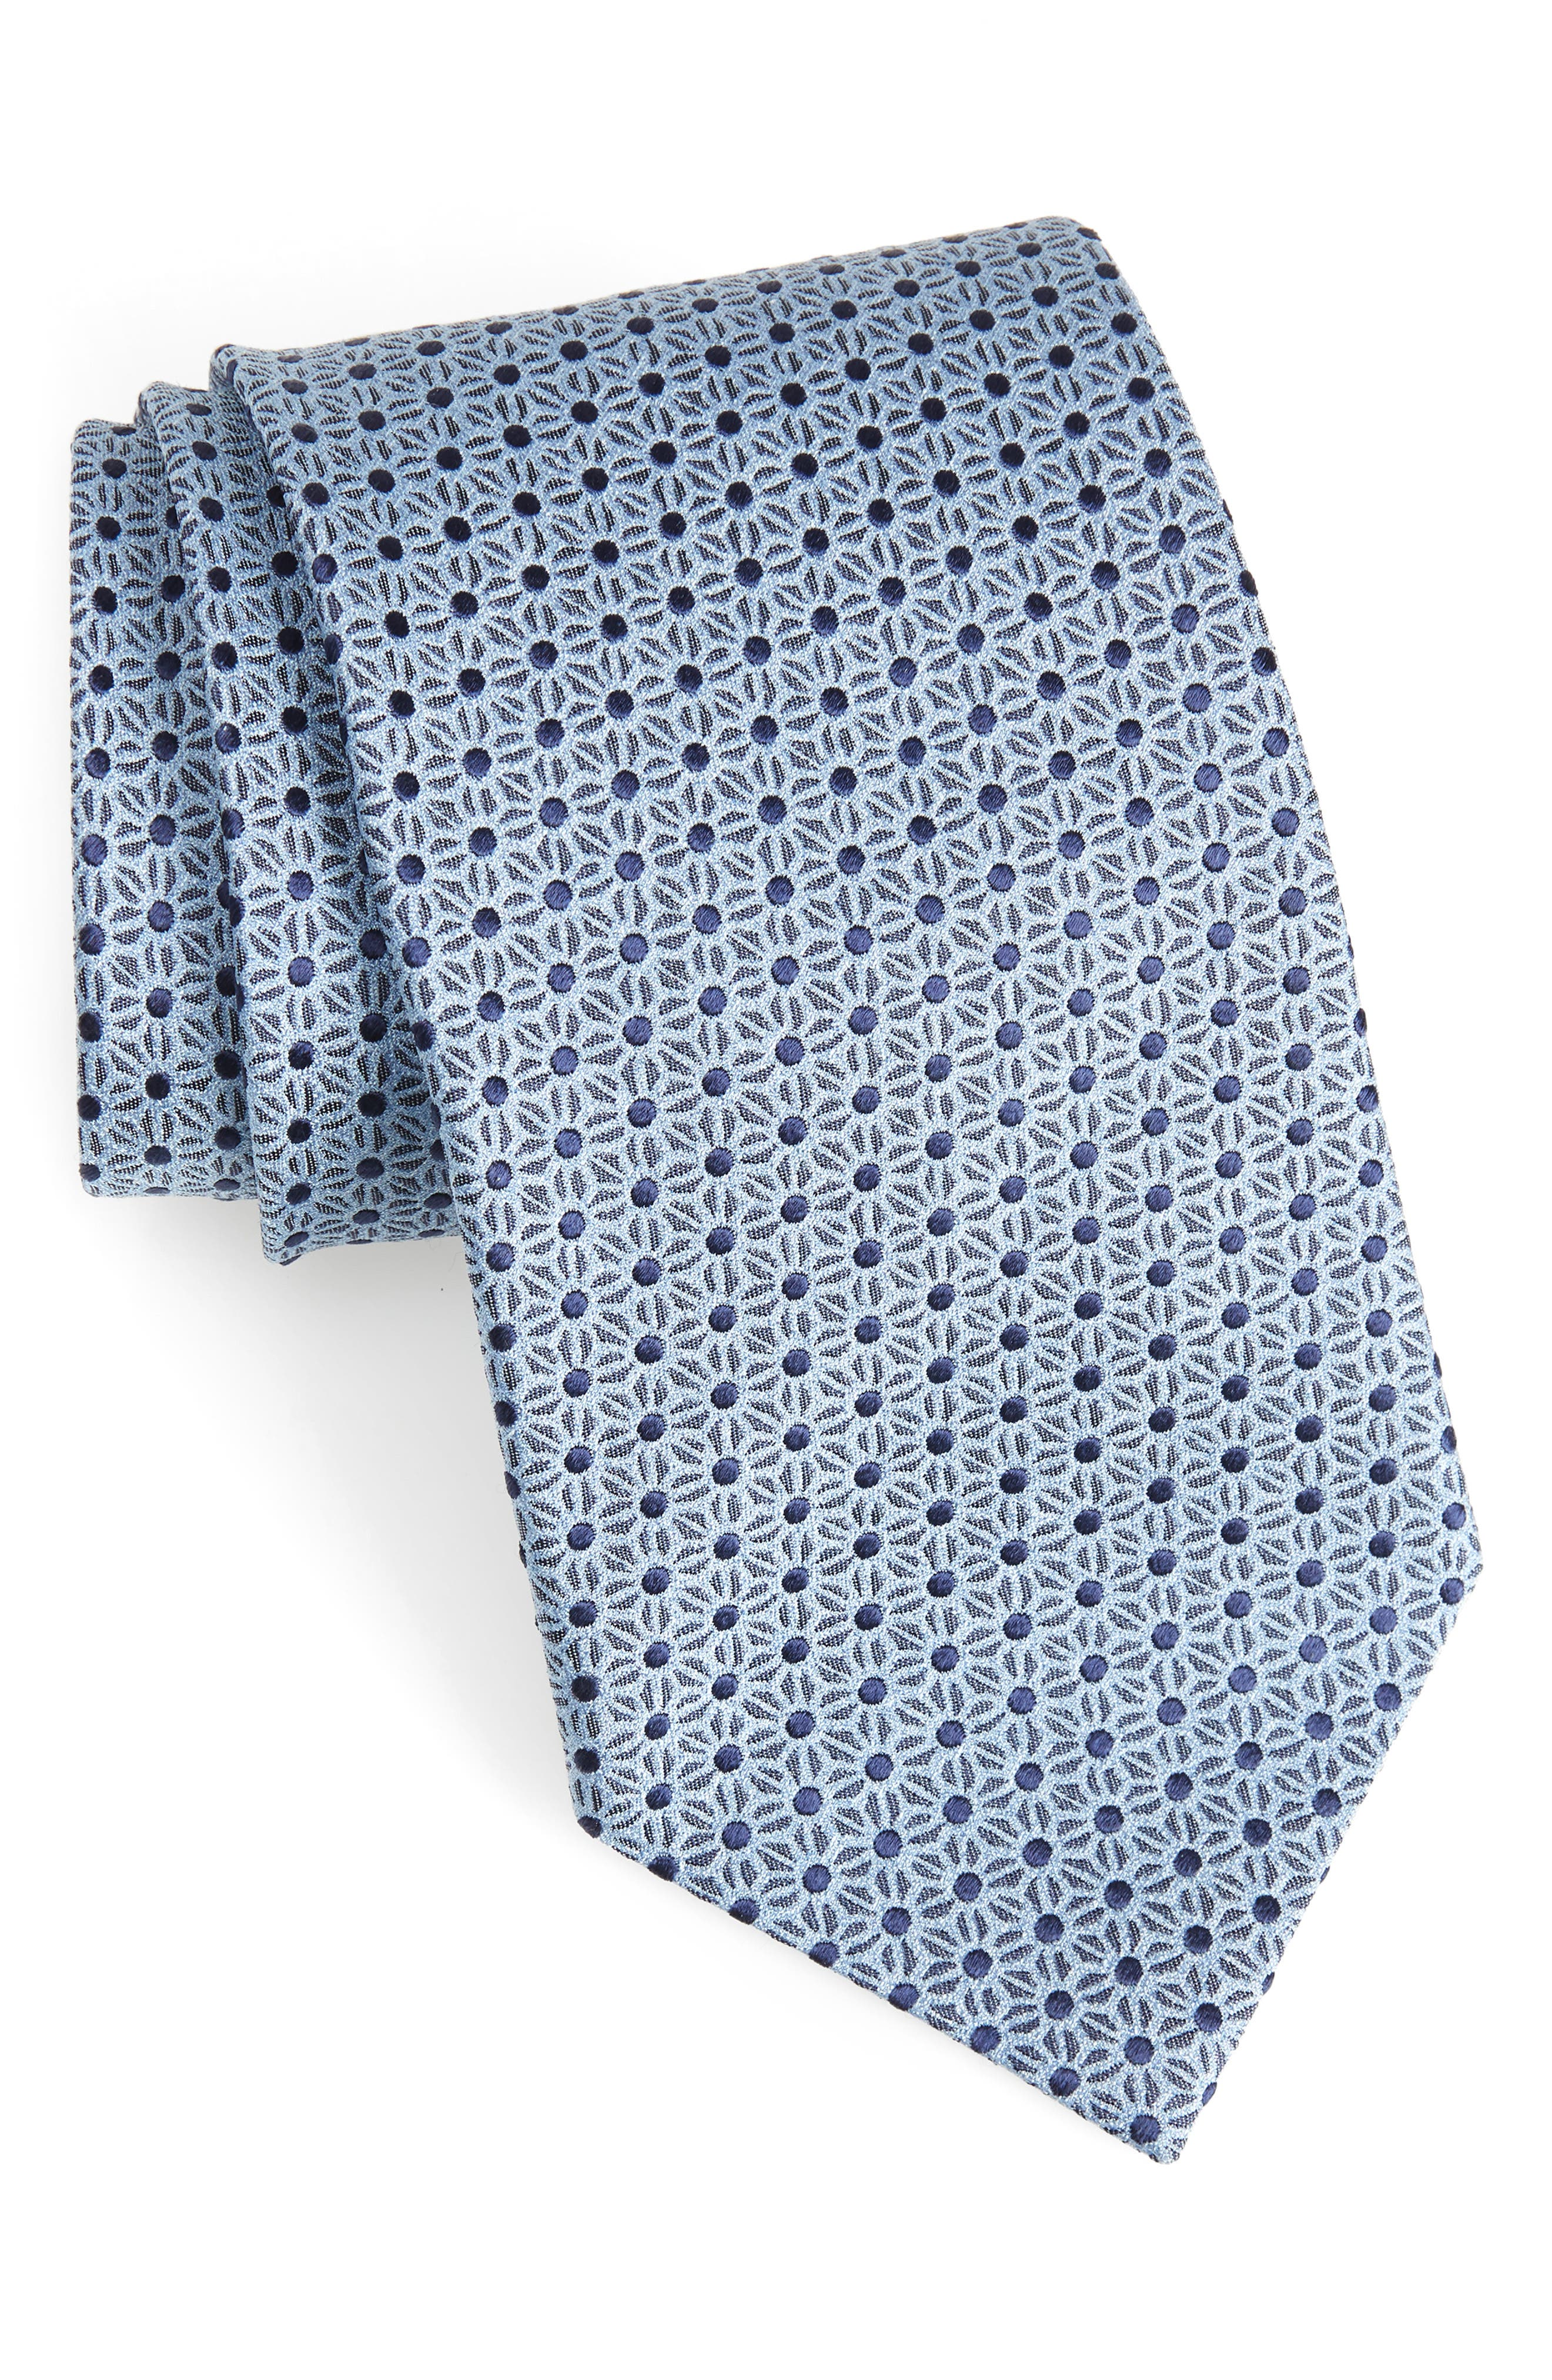 Ermenegildo Zegna Floral Silk Tie (X-Long)